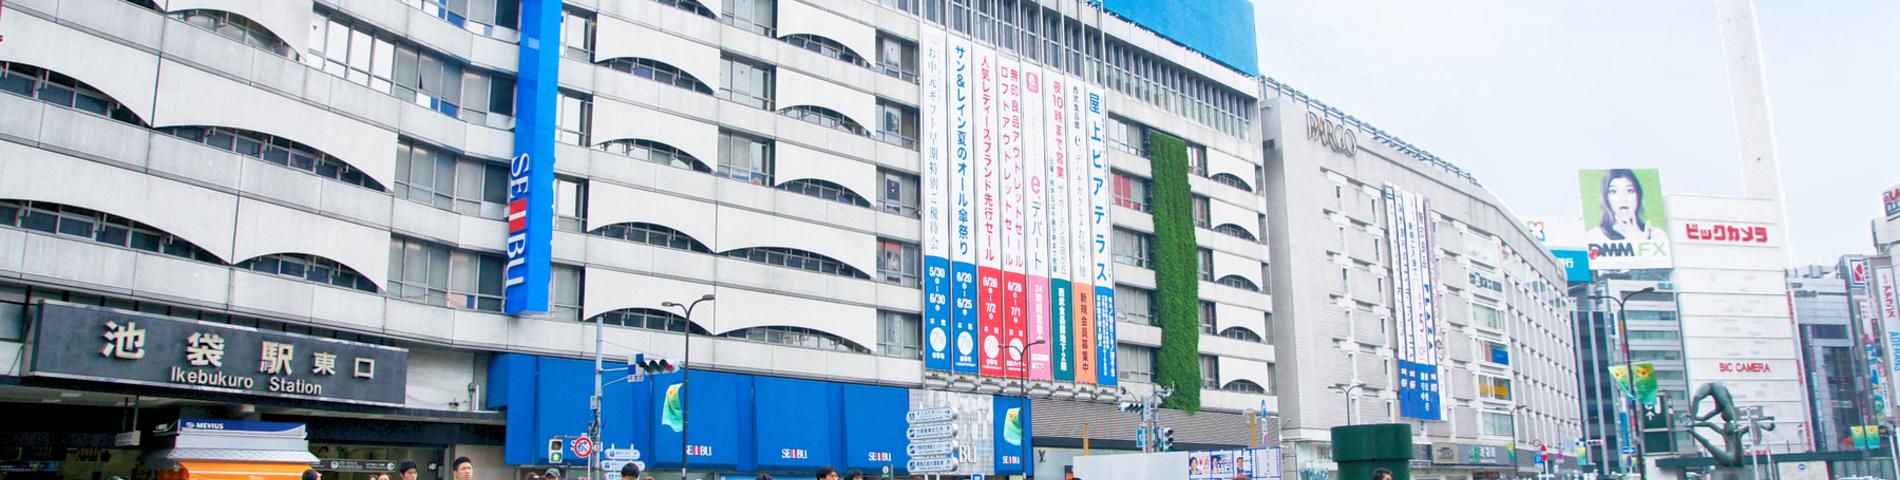 ISI Language School - Ikebukuro Campus зображення 1